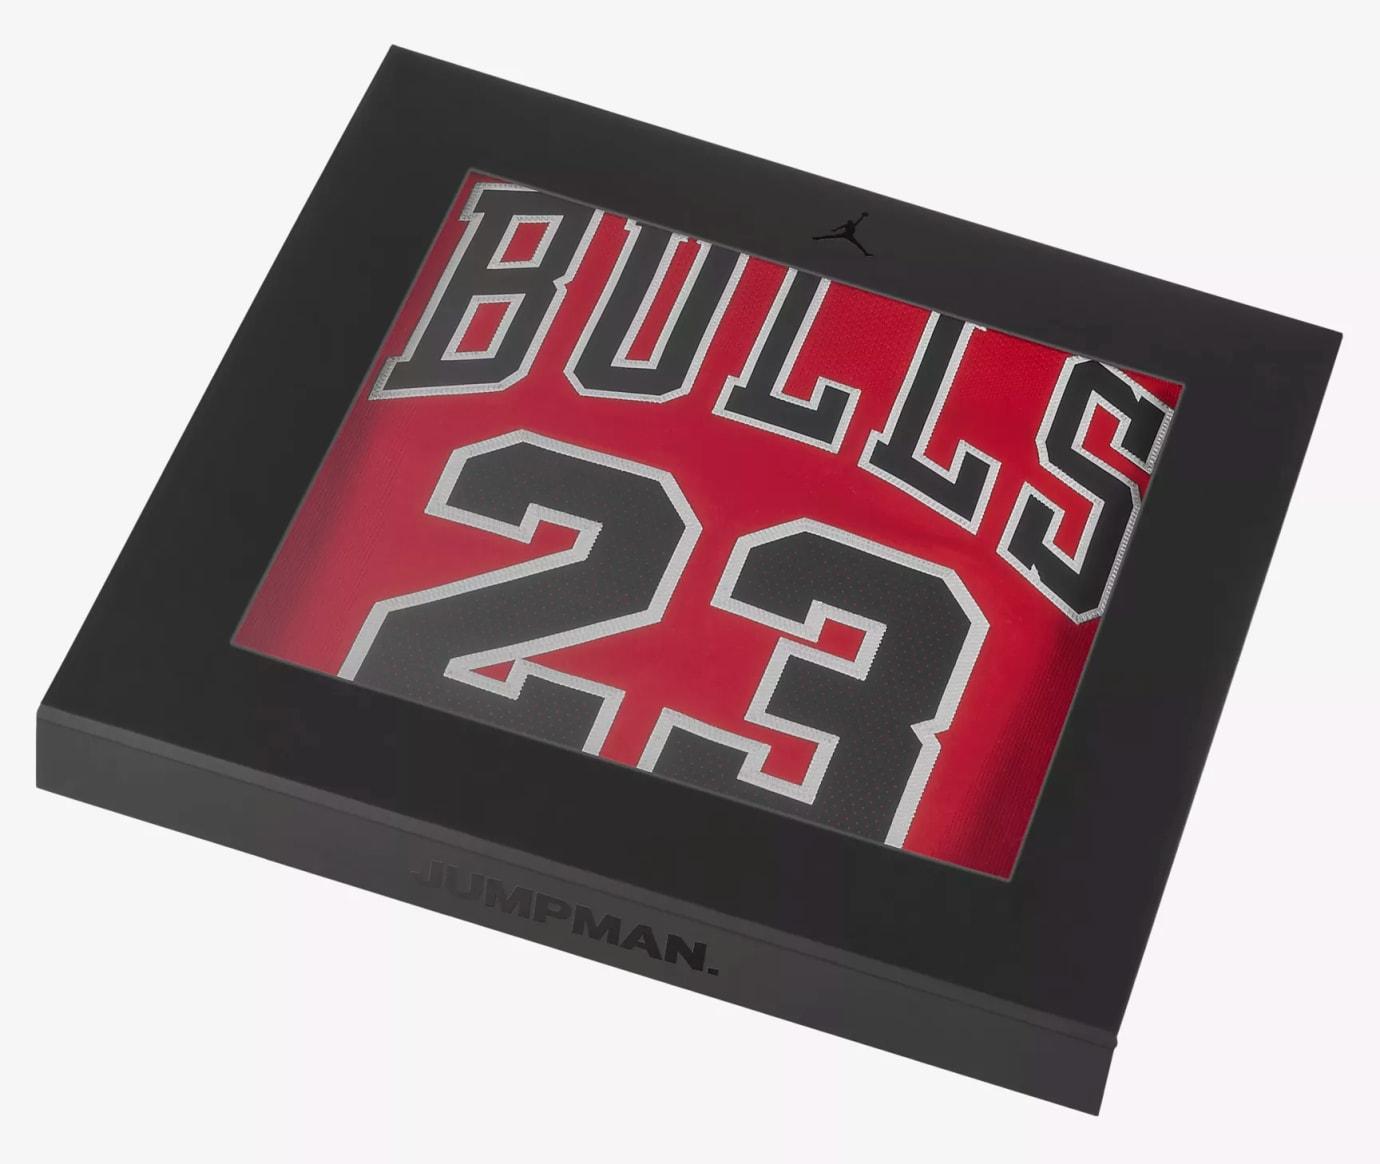 online store 687a3 6bbc5 Image via Nike Nike Michael Jordan  Last Dance  Jersey BV6246-657 (Soft  Touch Box)